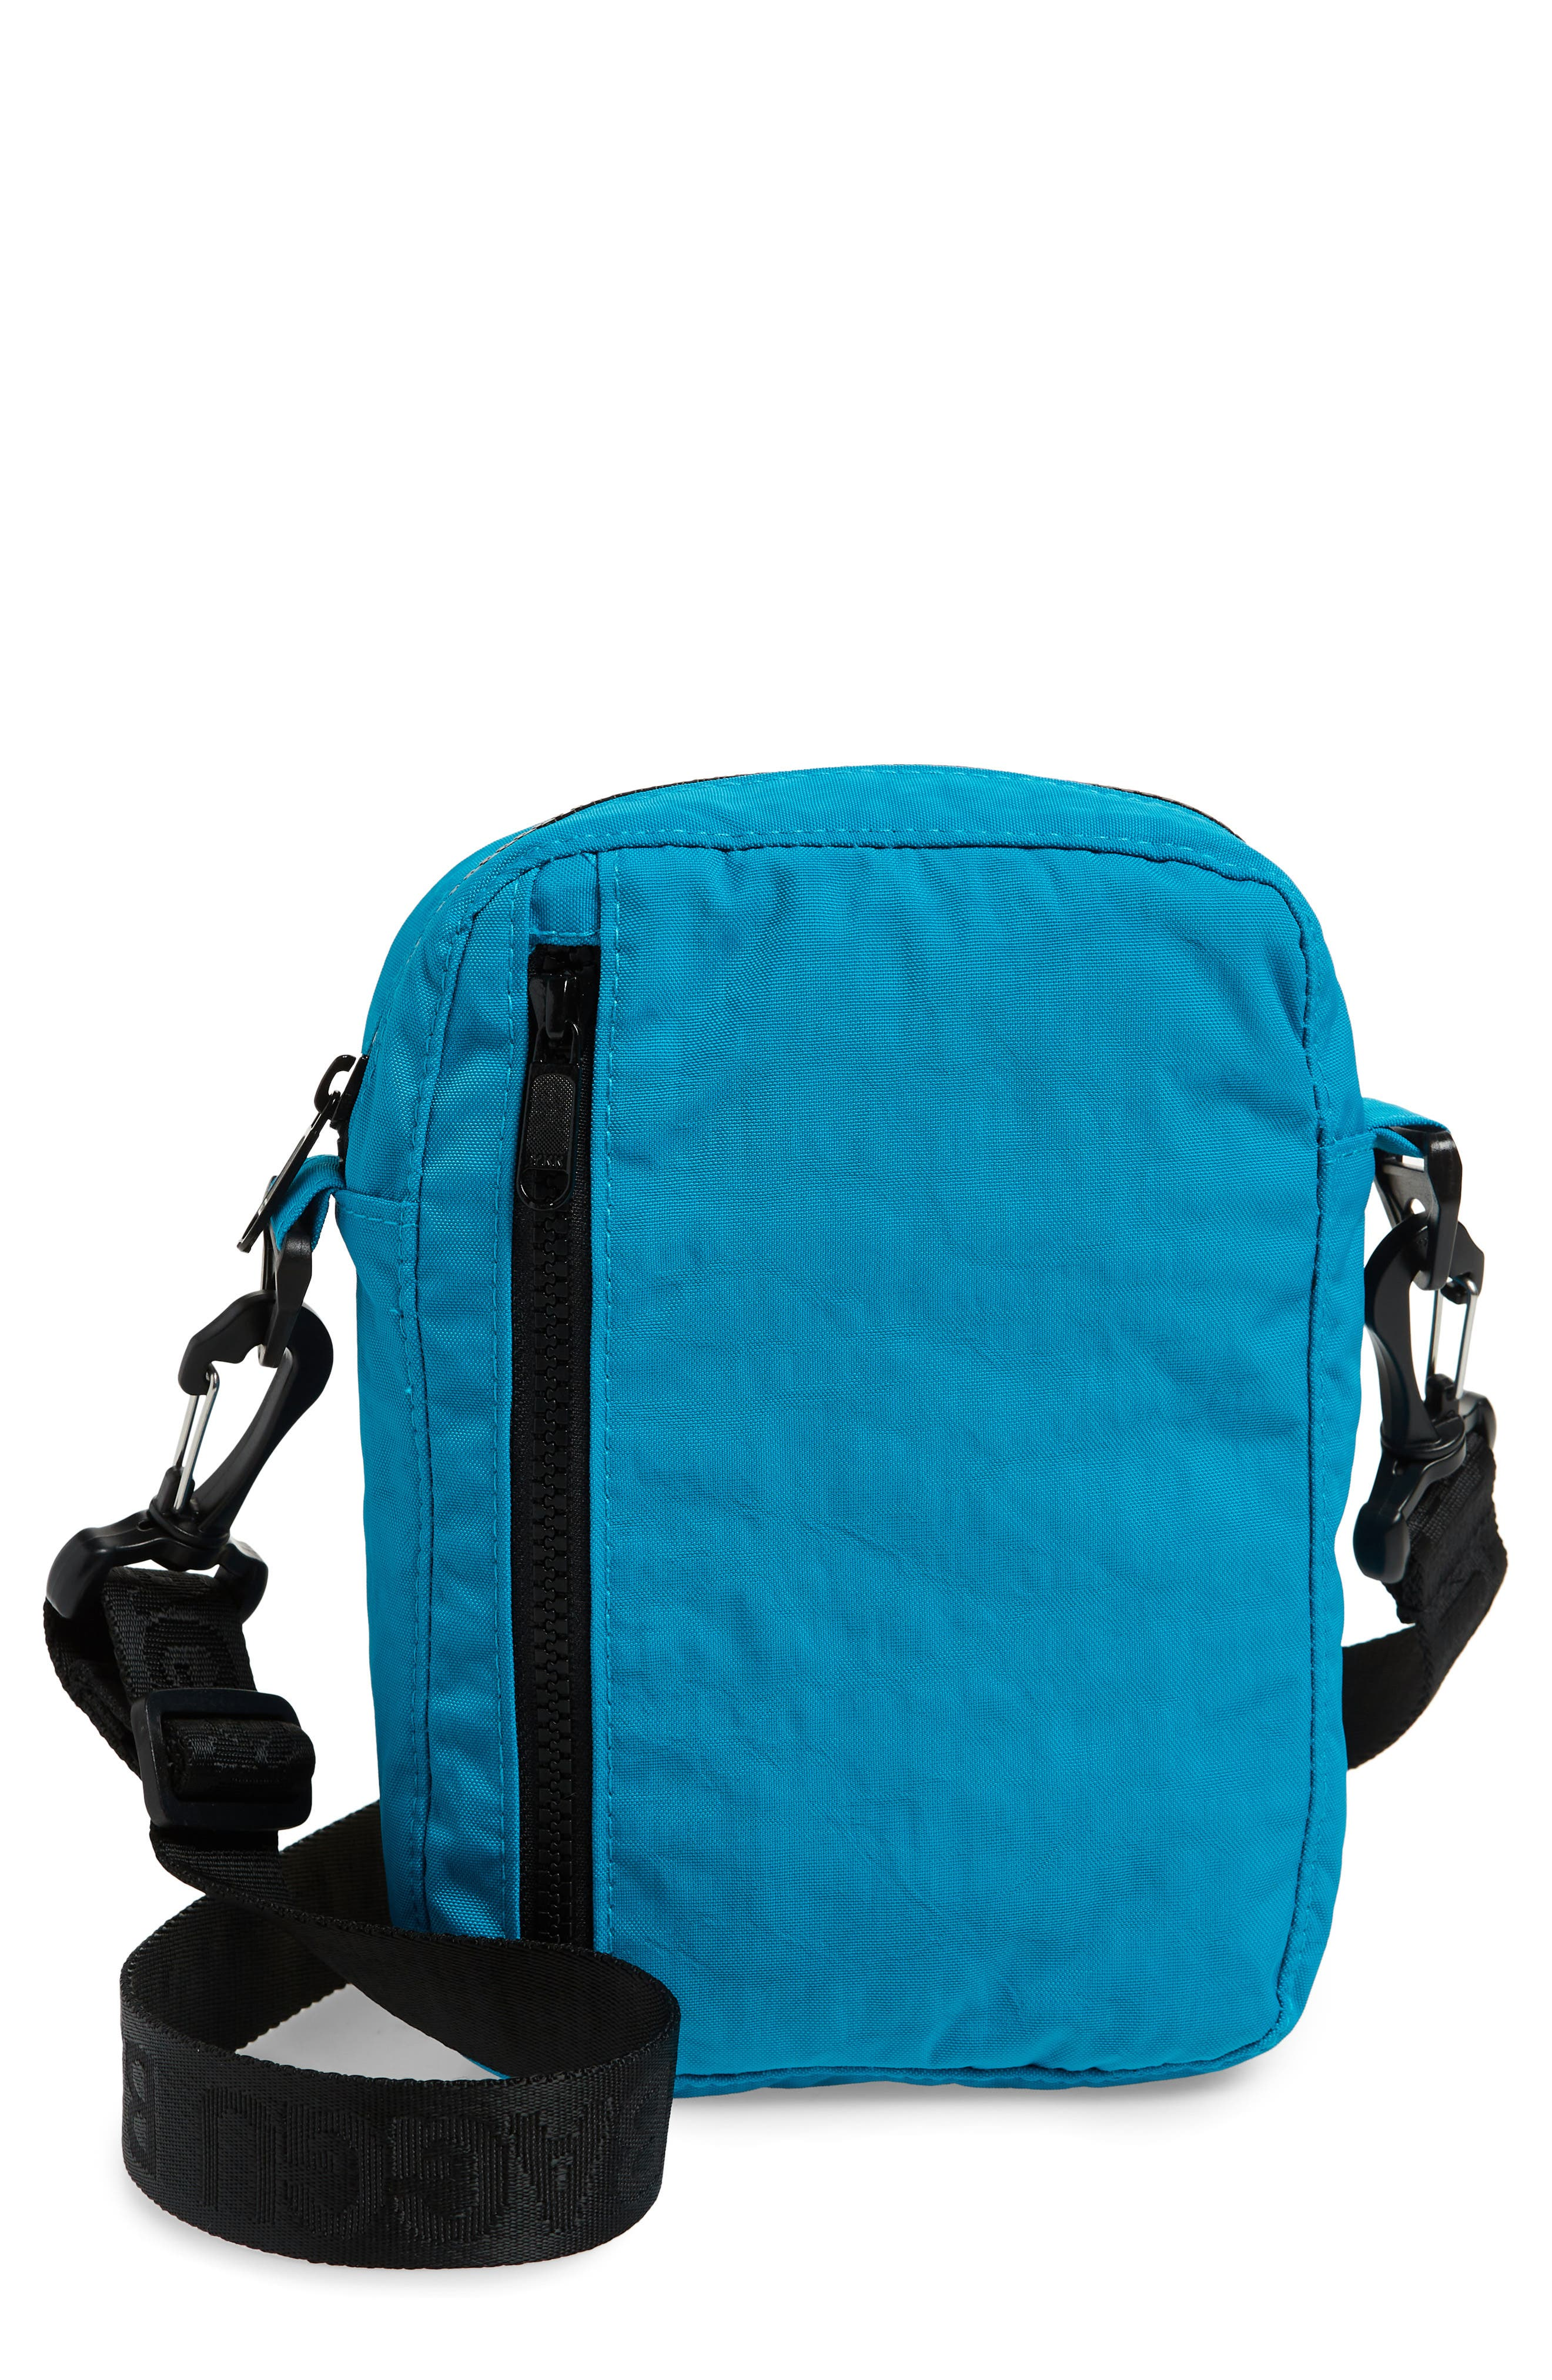 Sport Nylon Canvas Crossbody Bag